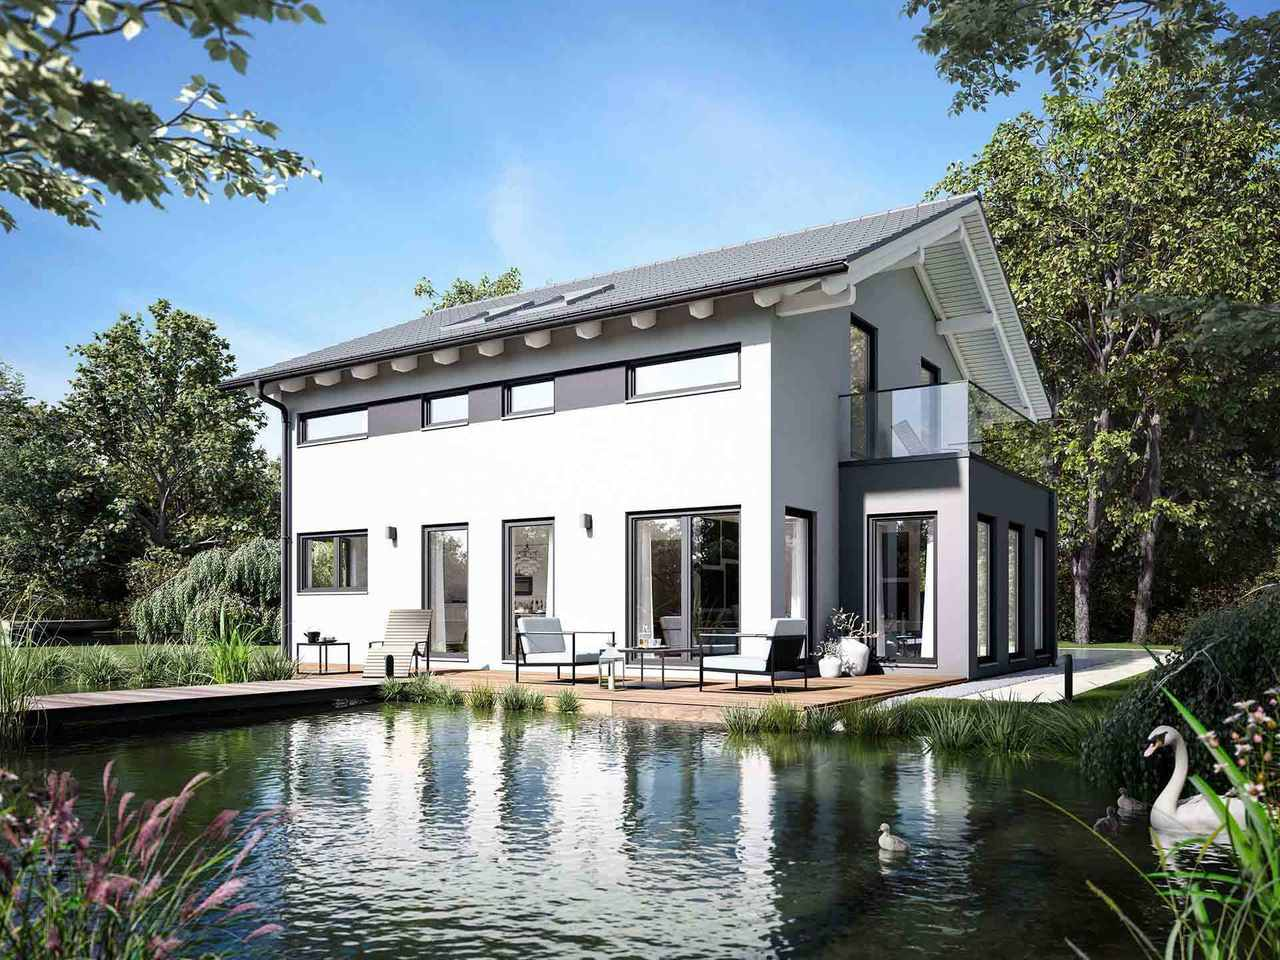 Einfamilienhaus Solitaire-E-145-E4 - Schwabenhaus